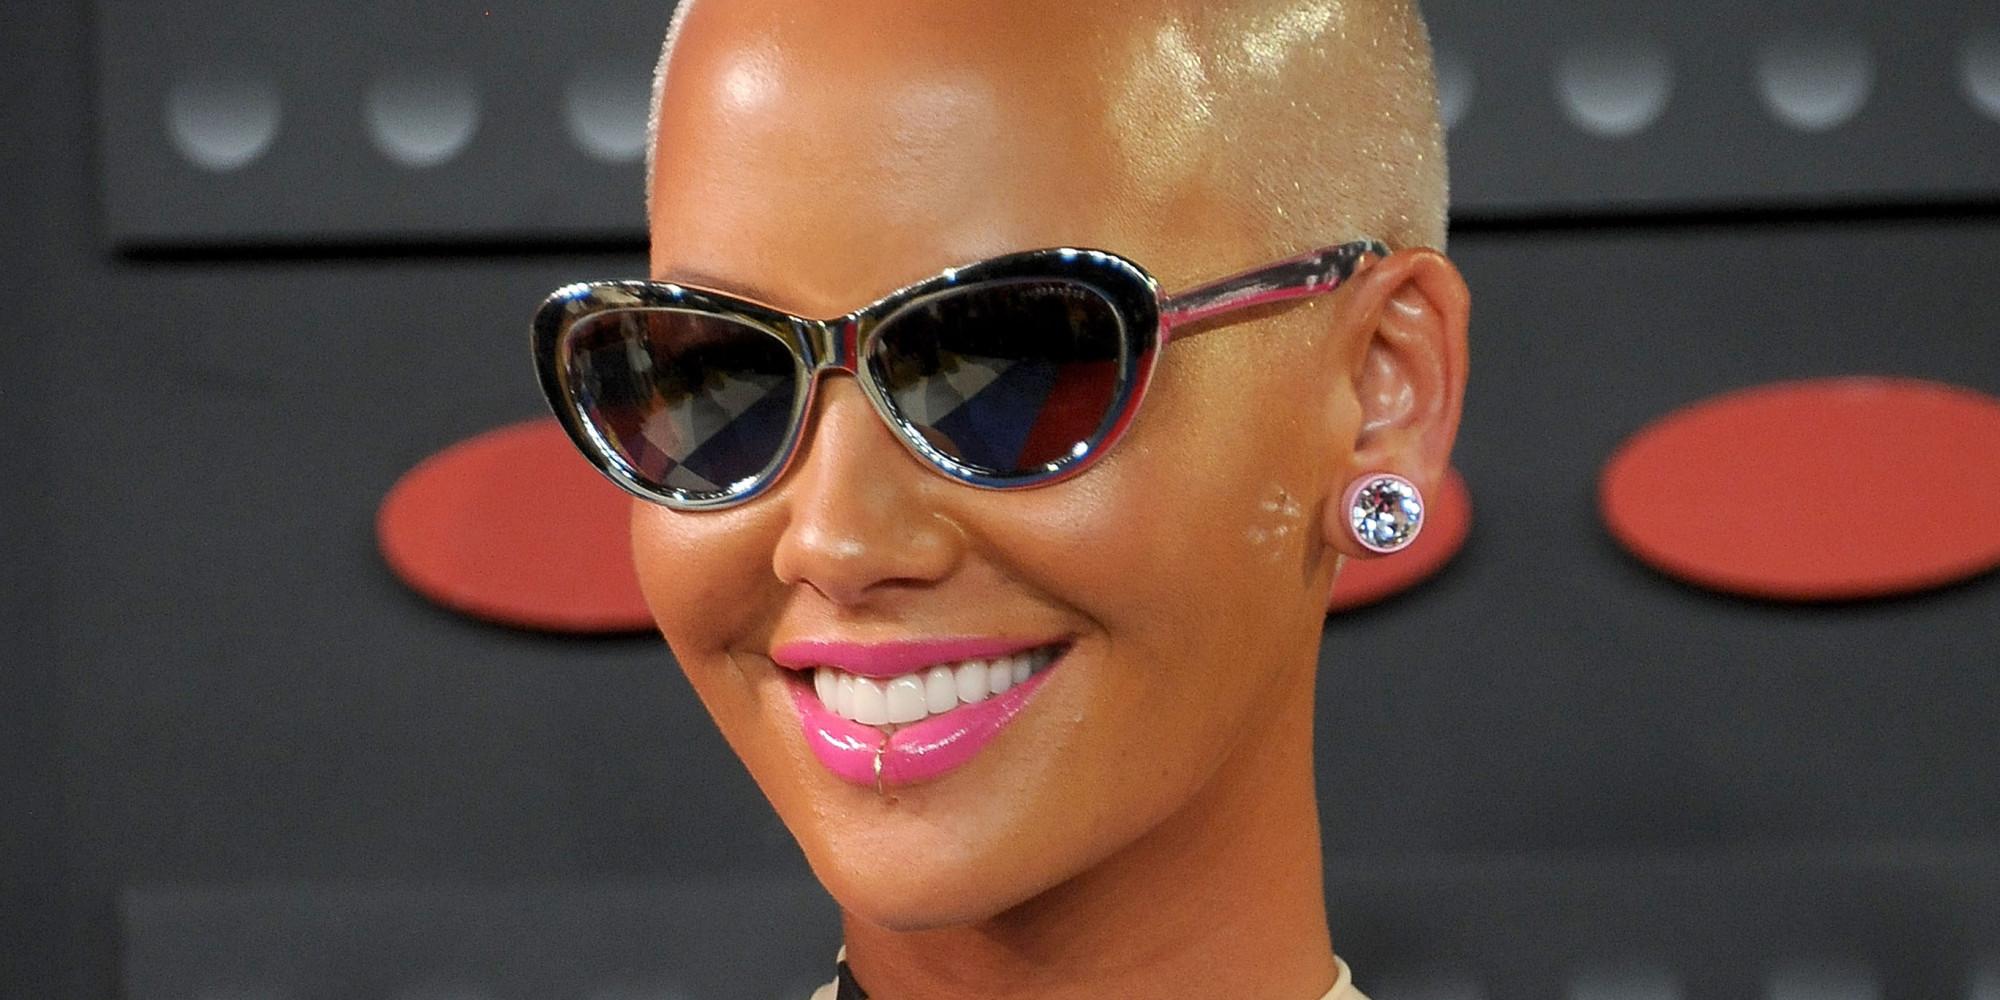 Amber Rose Sunglasses Line